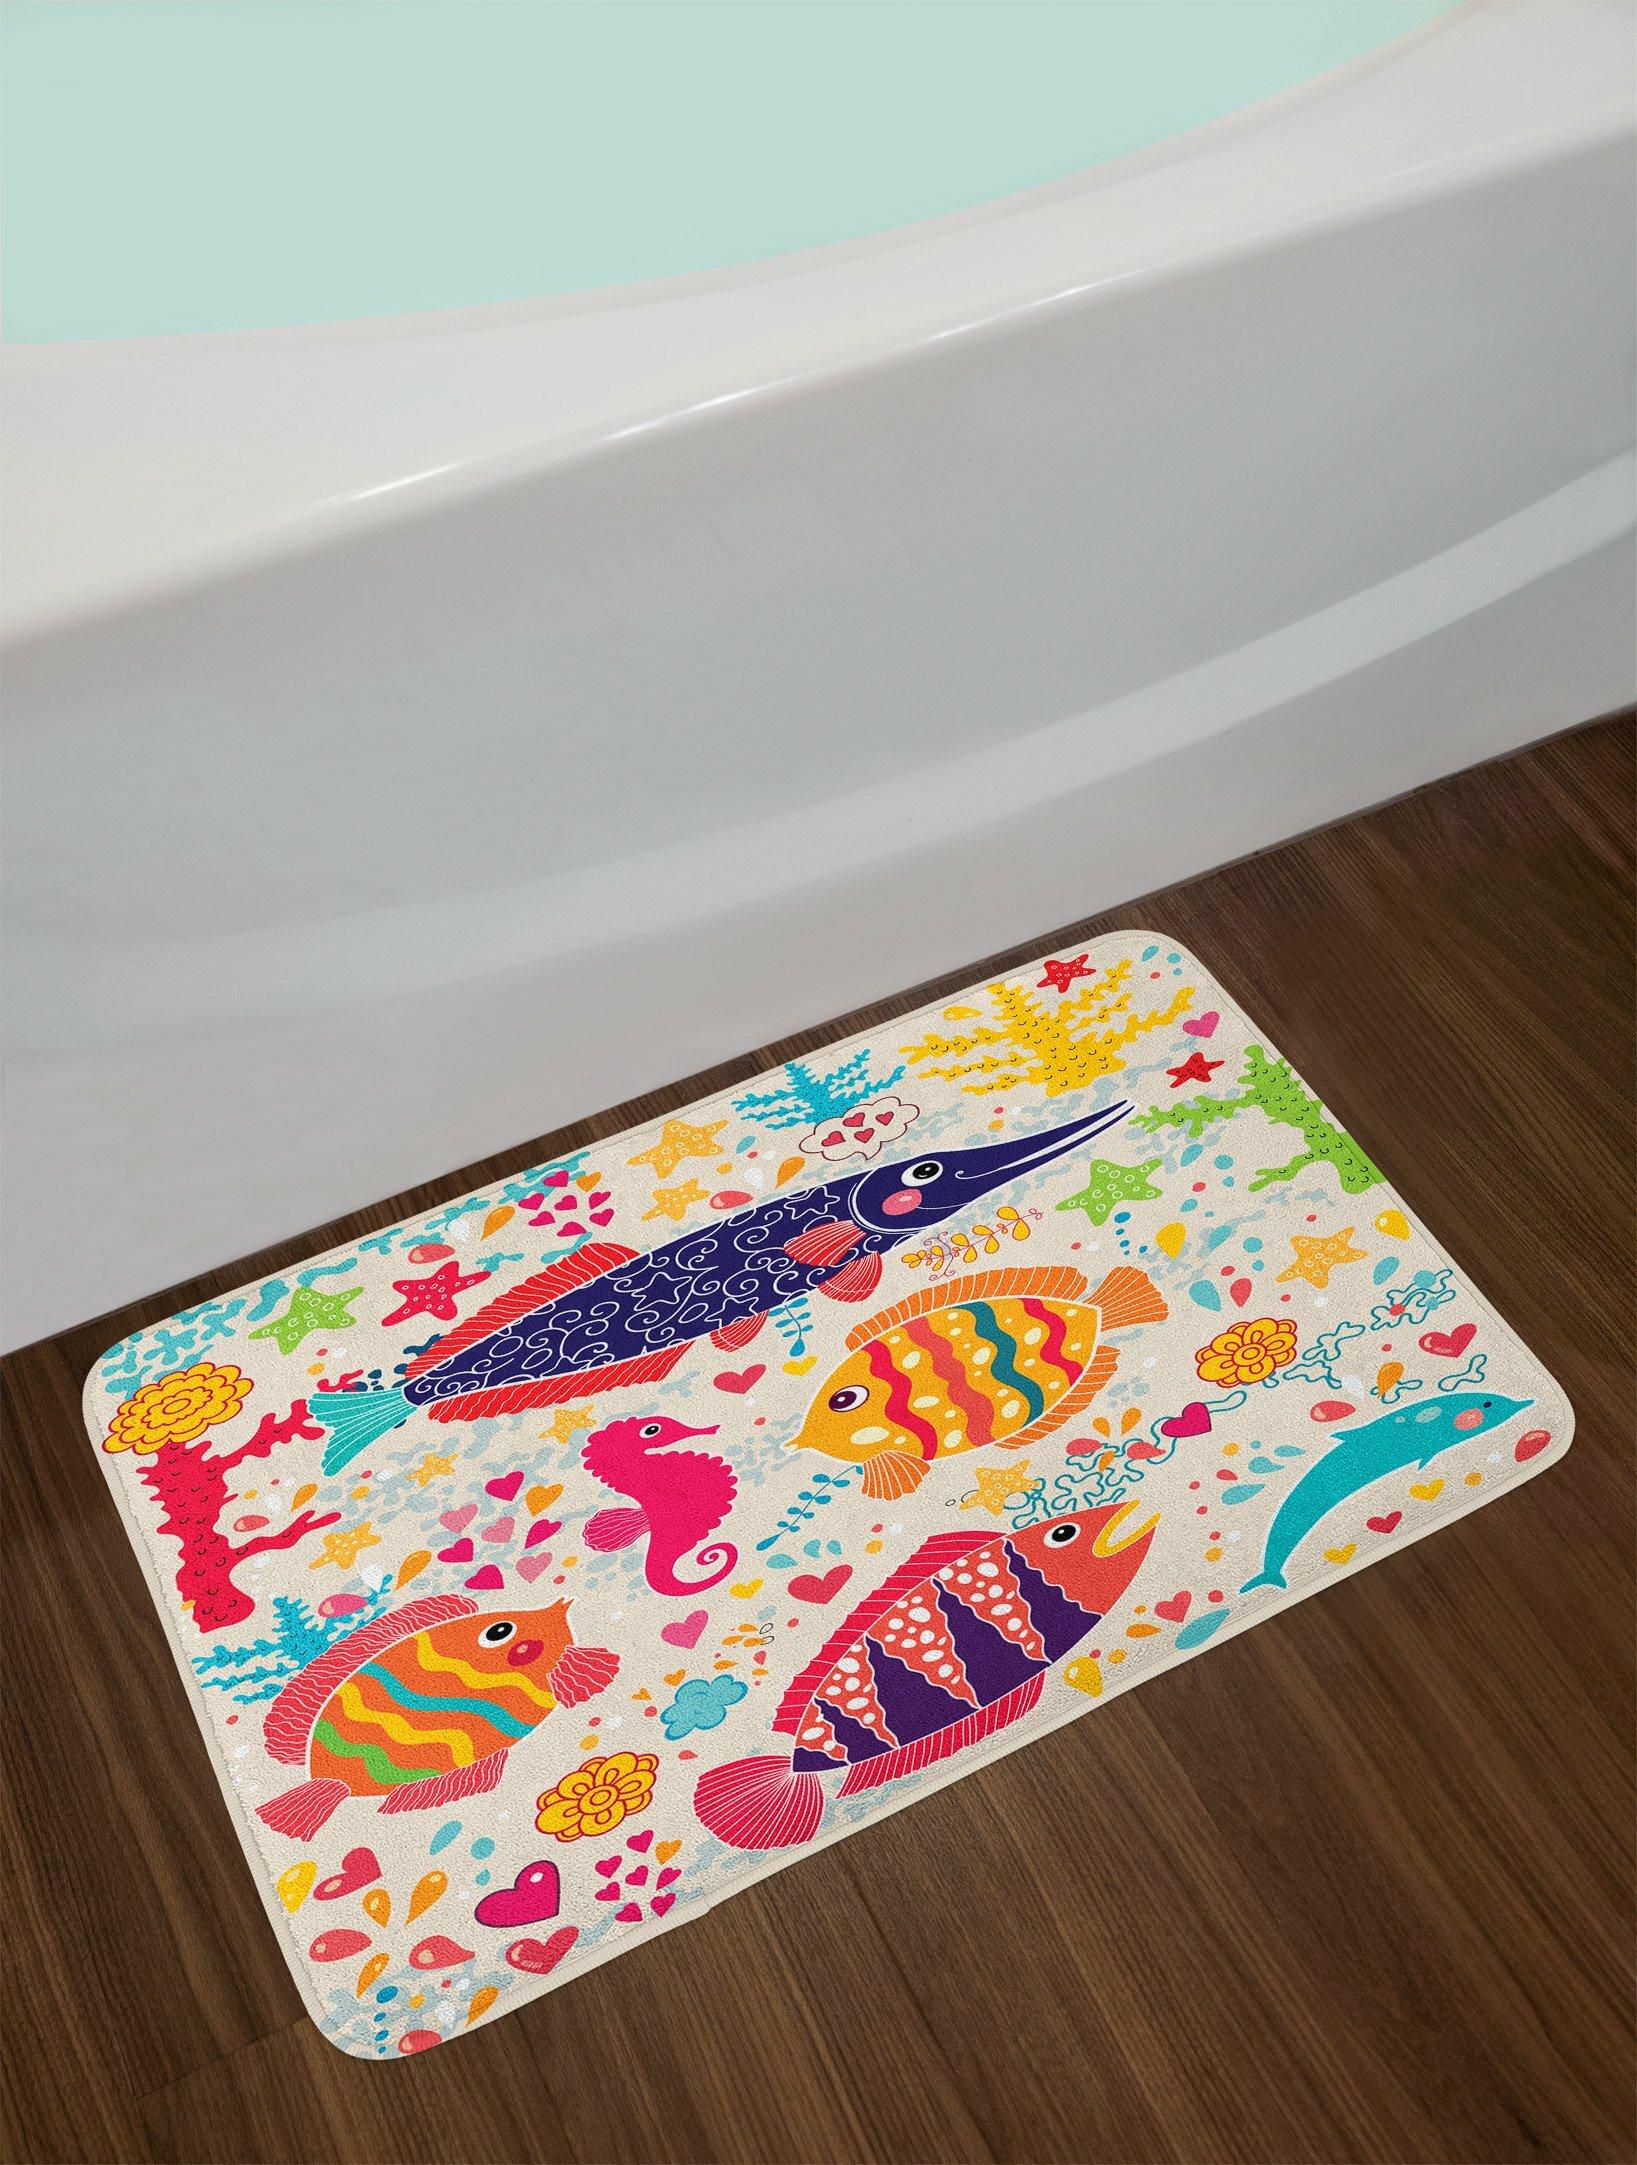 Sea Animals Cartoon Whale with Sea Life Swimming Bath Rugs Non-Slip Door Mat New